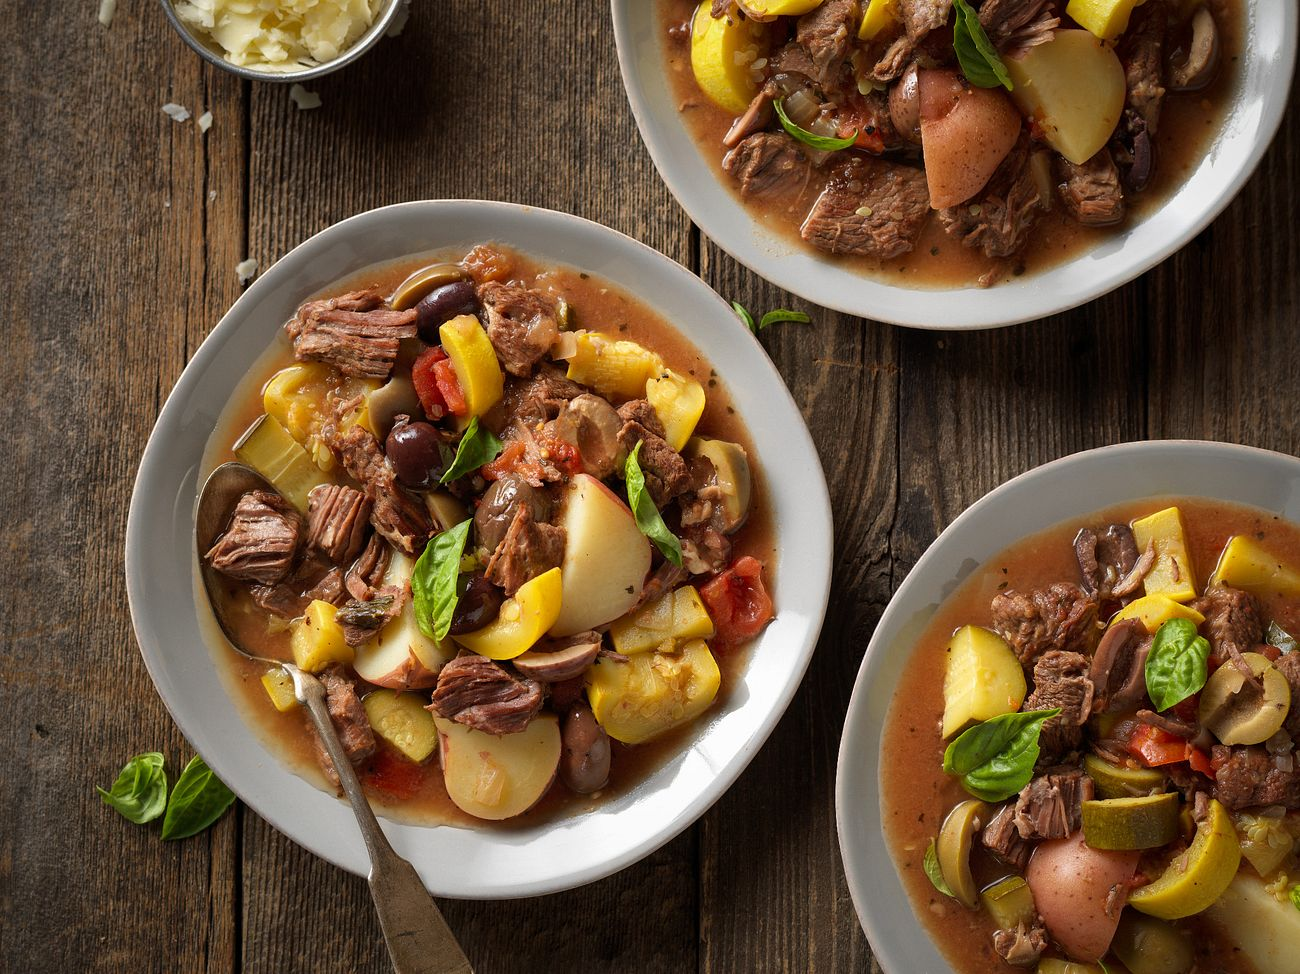 provencal-beef-stew-horizontal